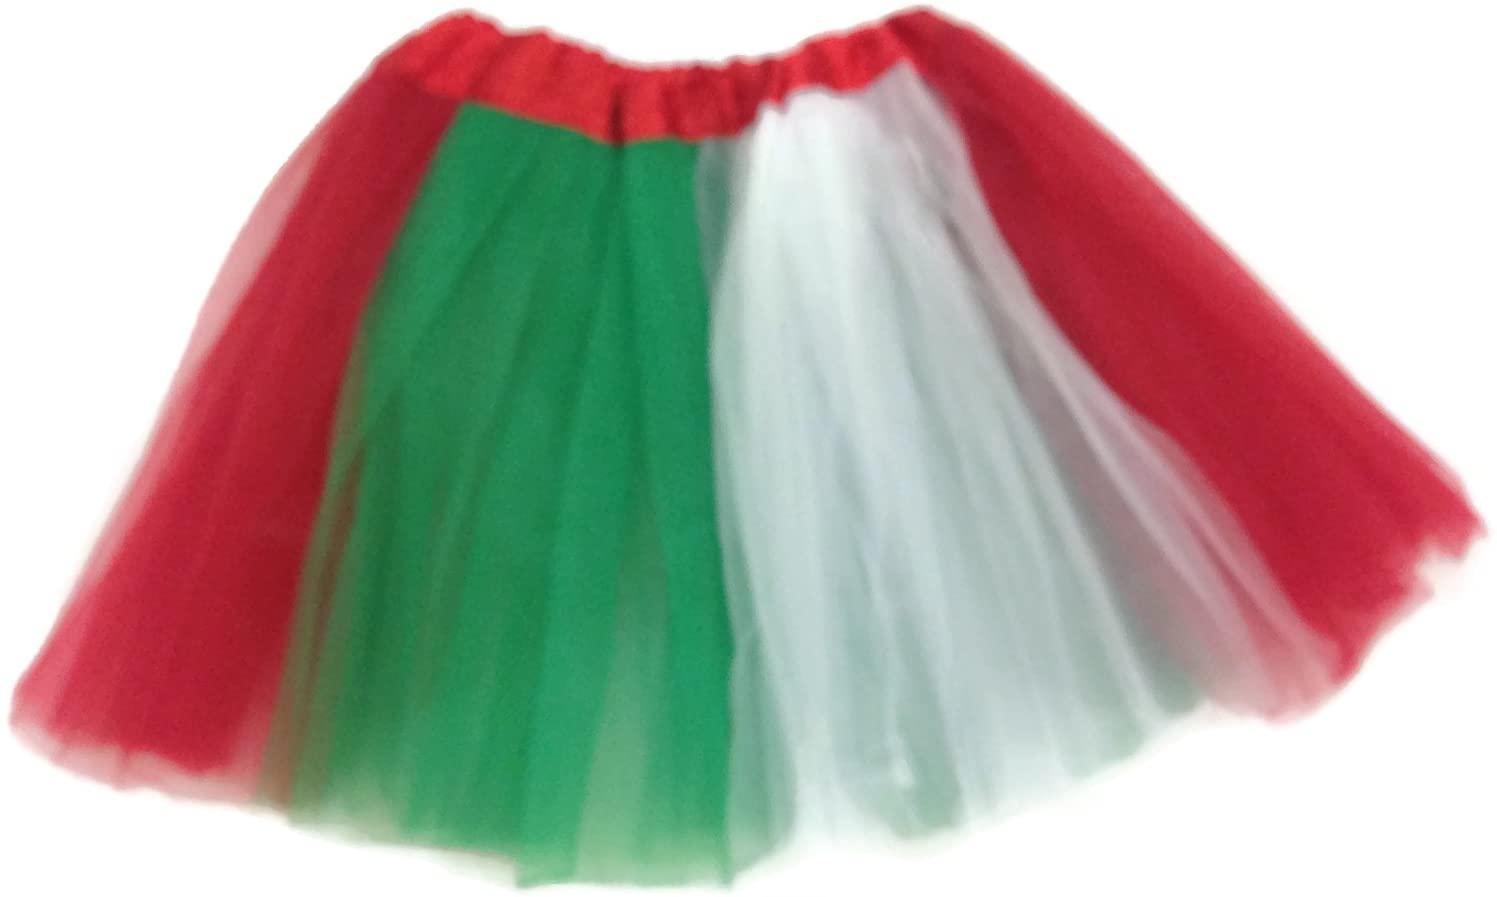 Rush Dance Colorful Ballerina Girls Dress-Up Princess Costume Recital Tutu (Kids 3-8 Years, Red/White/Kelly Green (Xmas))